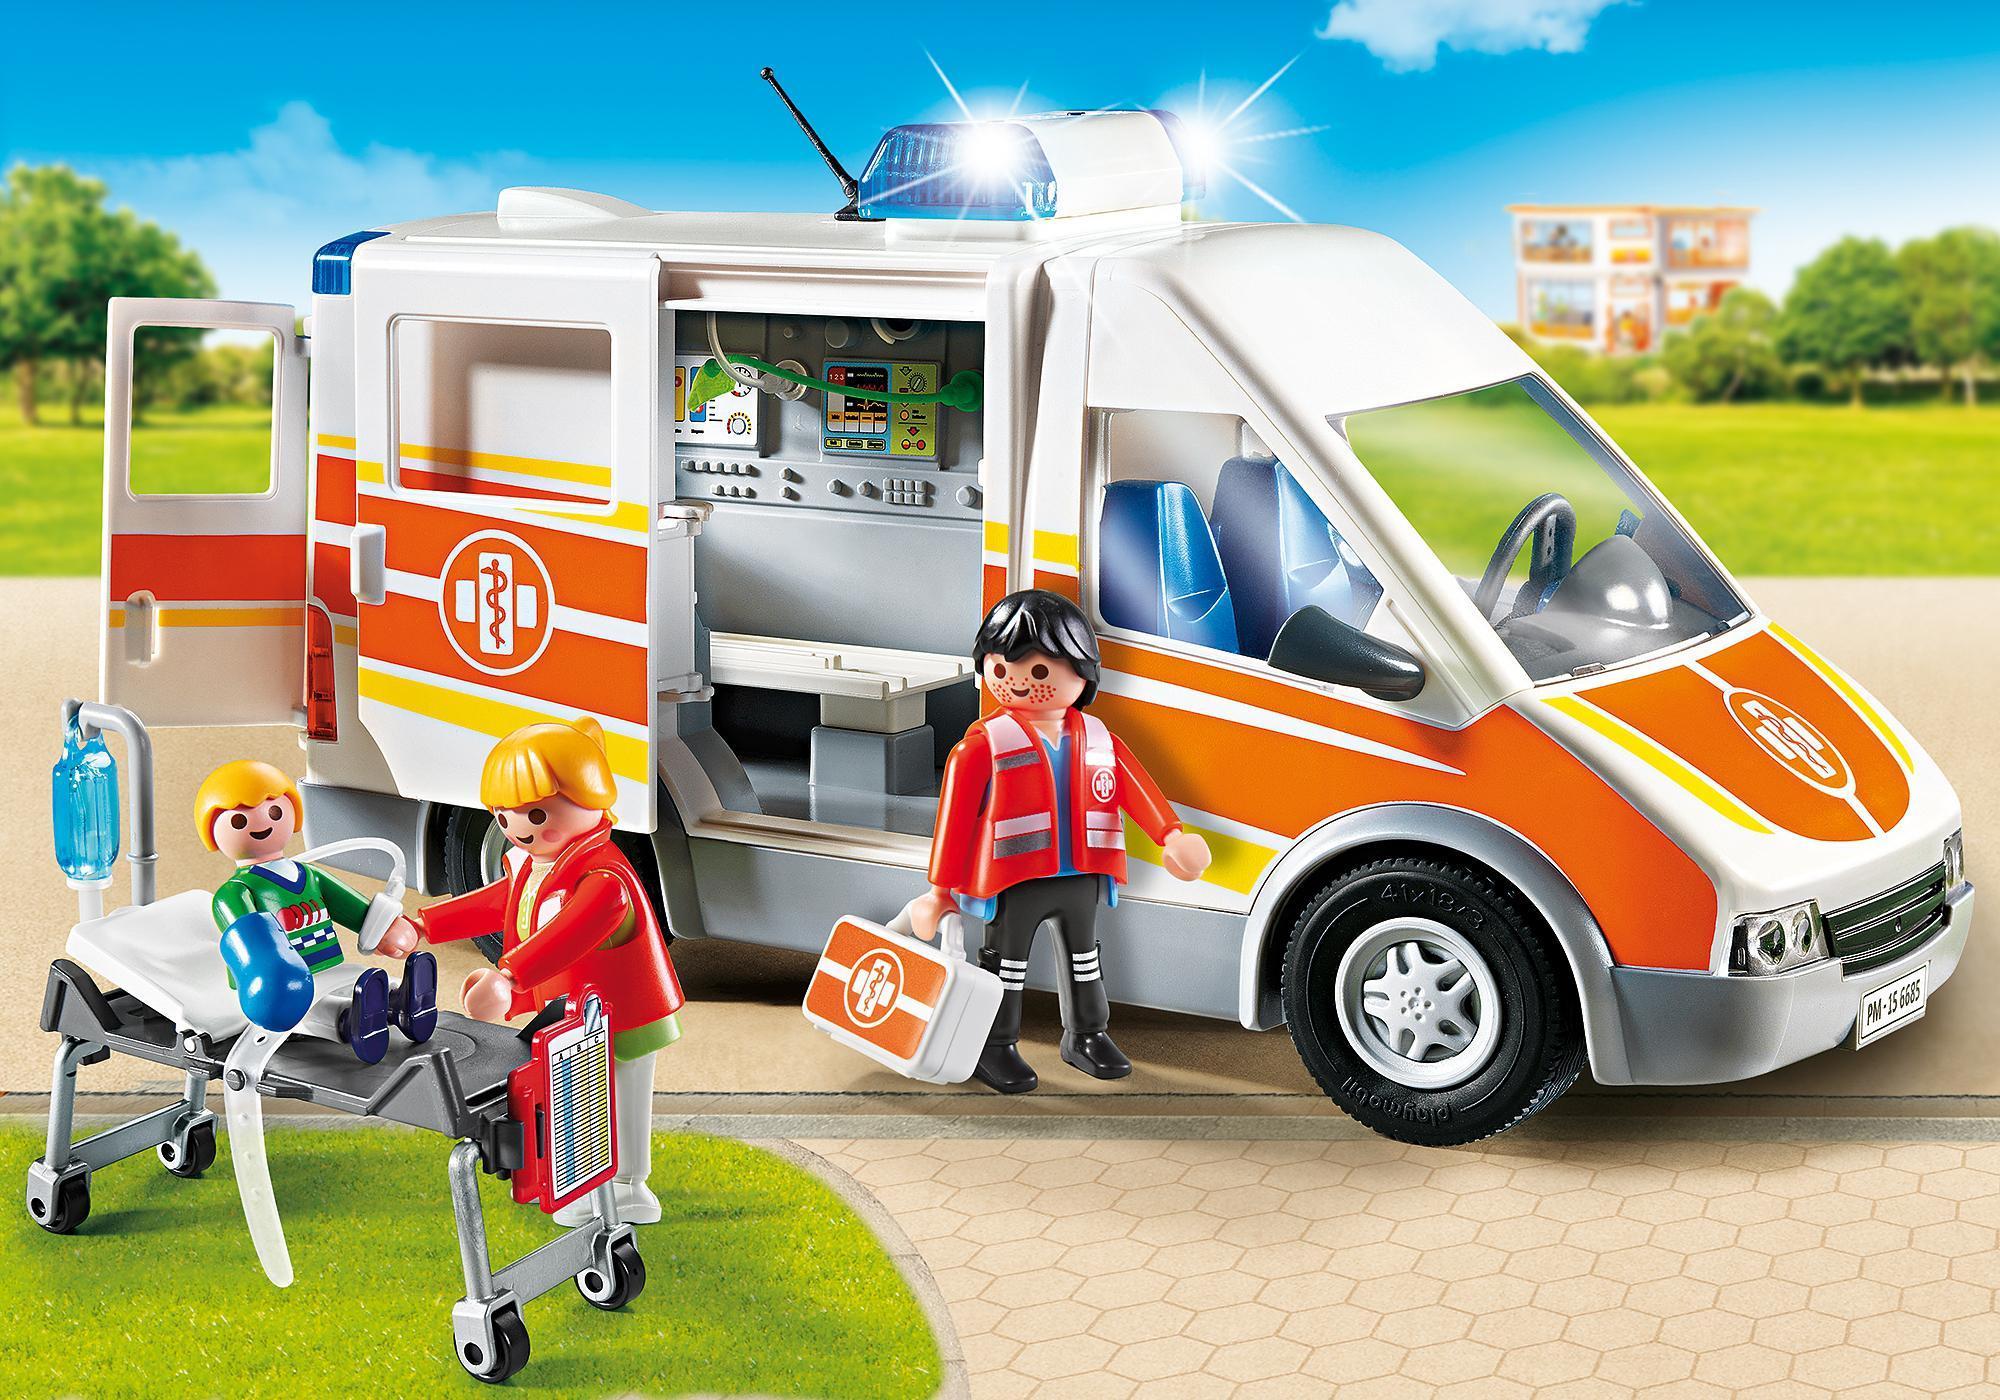 http://media.playmobil.com/i/playmobil/6685_product_detail/Ambulance avec gyrophare et sirène